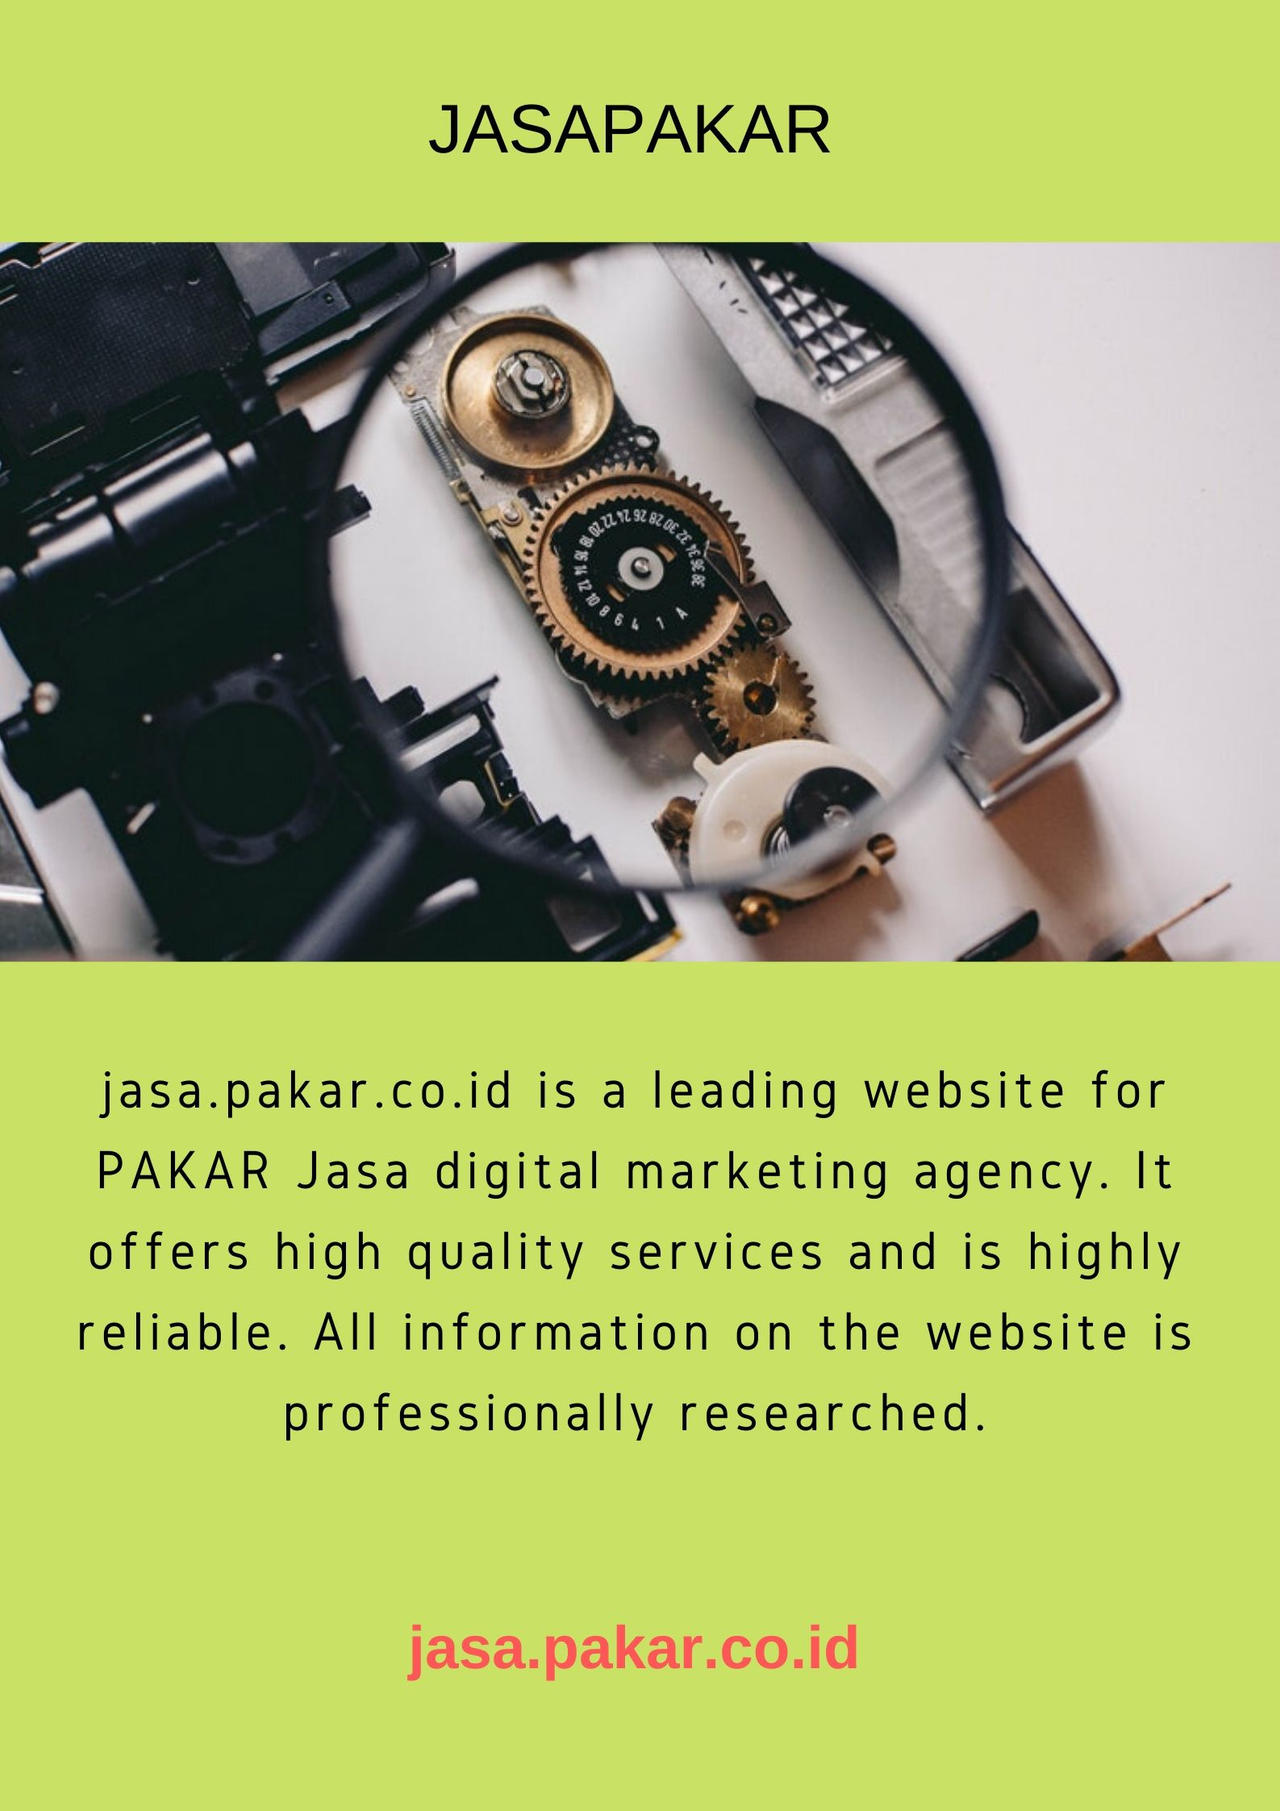 PAKAR Jasa Digital Marketing Agency by garymacoy52 on DeviantArt